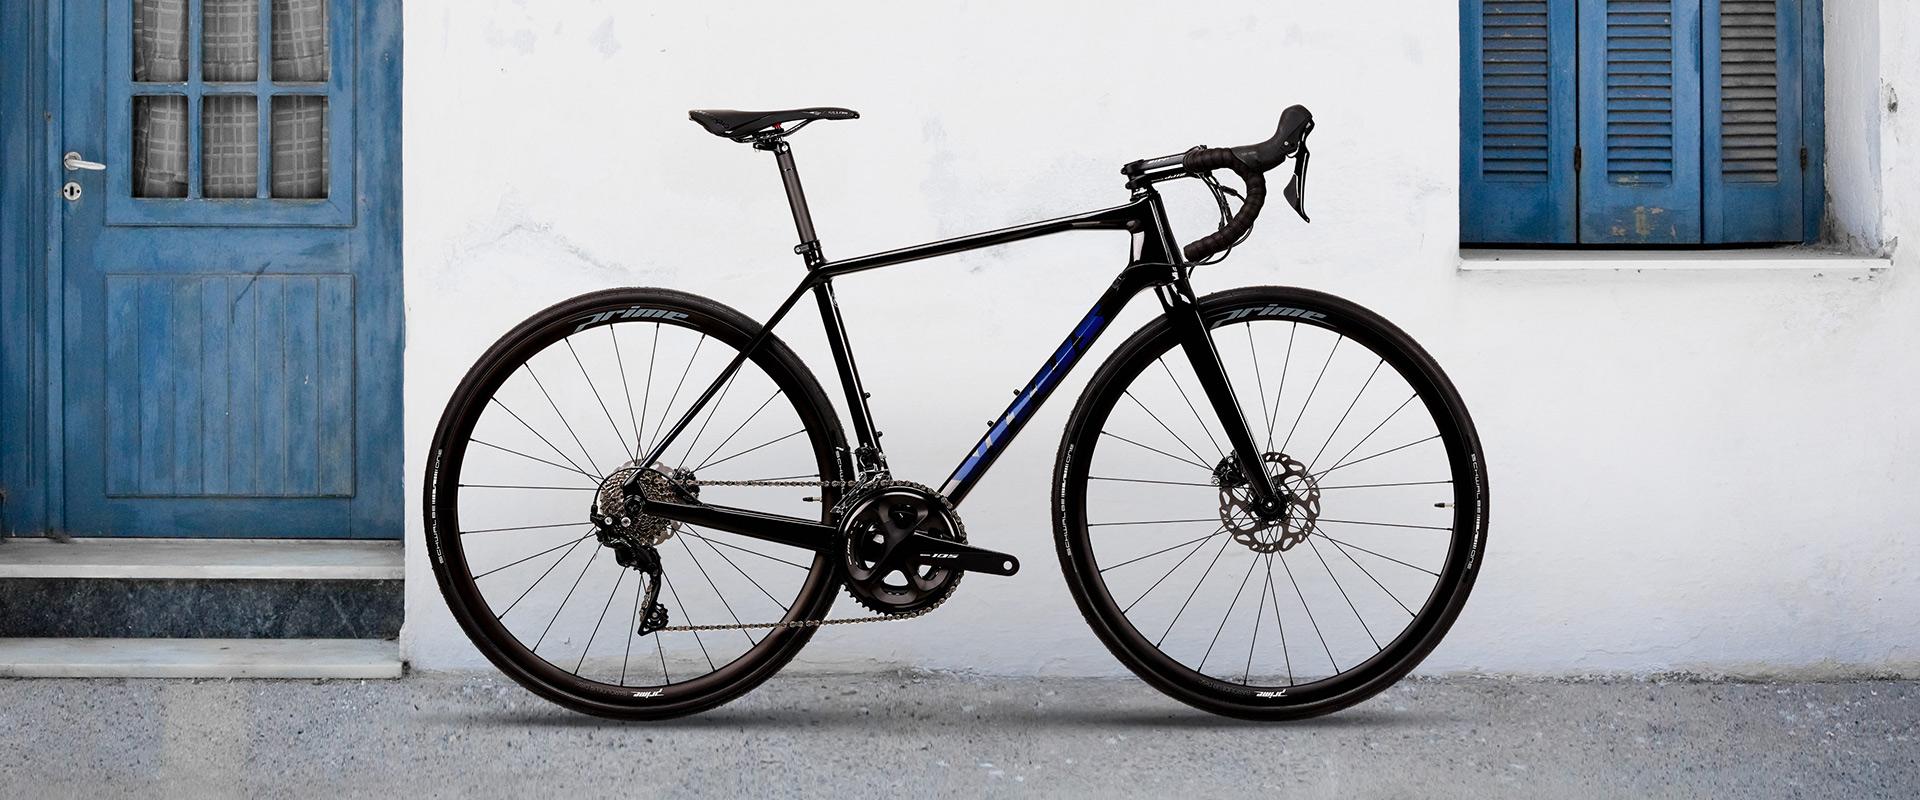 Vitesse Evo Cr Road Bike 105 Vitus Bikes